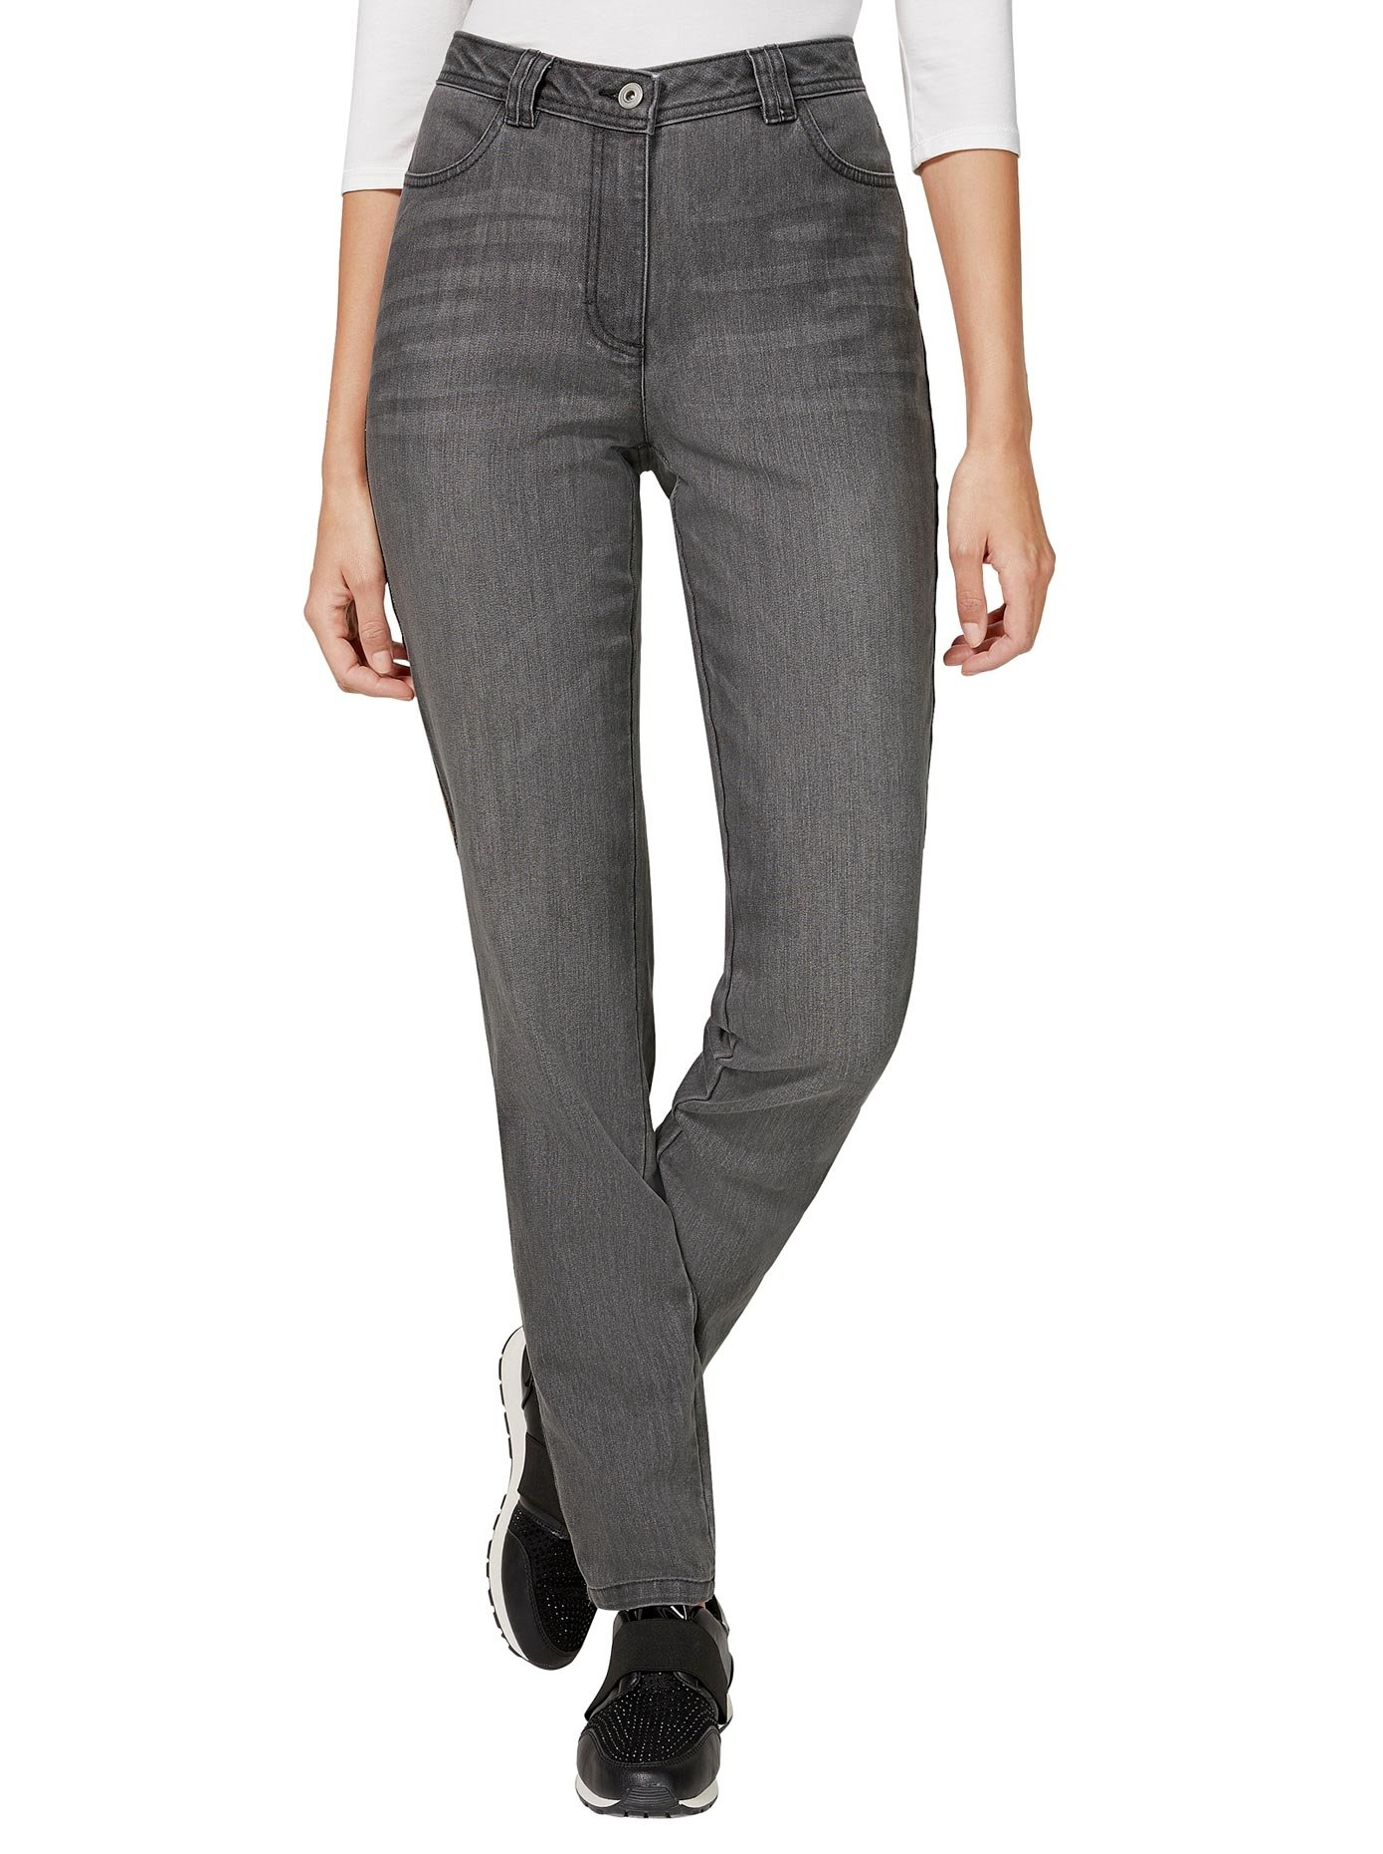 Classic Inspirationen prettige jeans online kopen op otto.nl